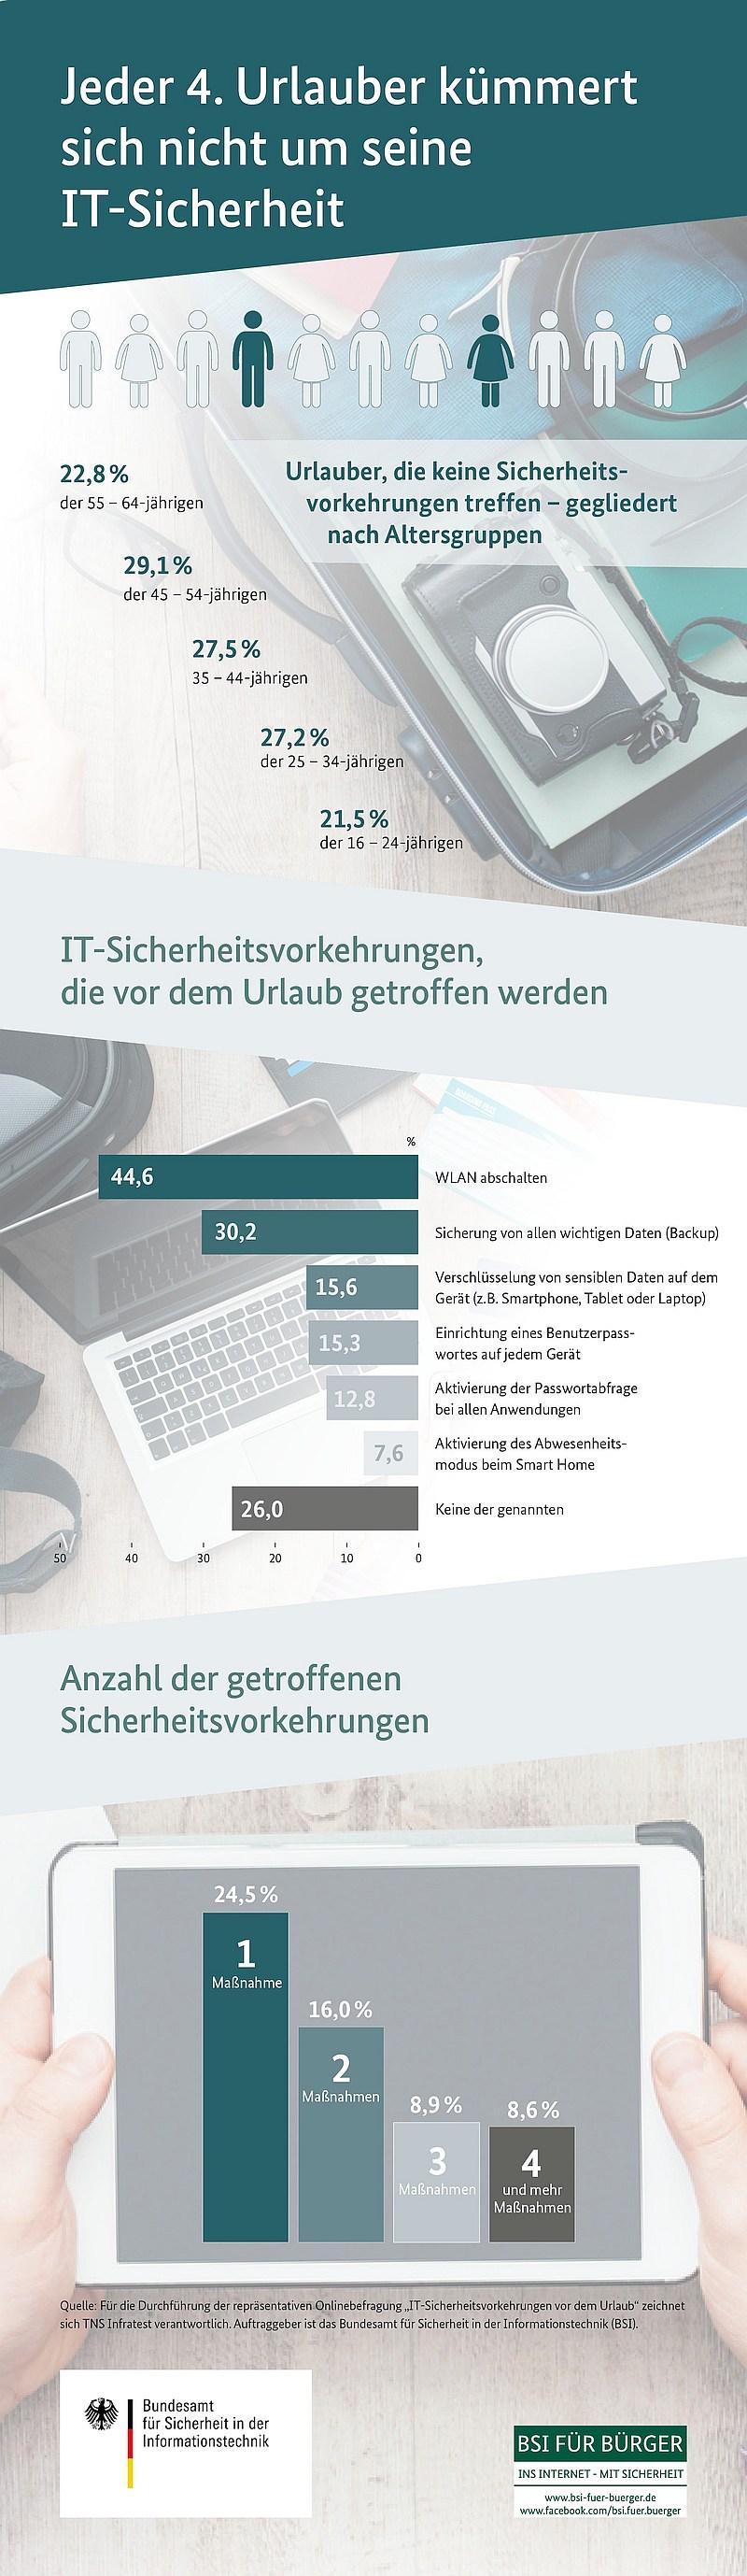 infografik bsi urlaub sicherheit it